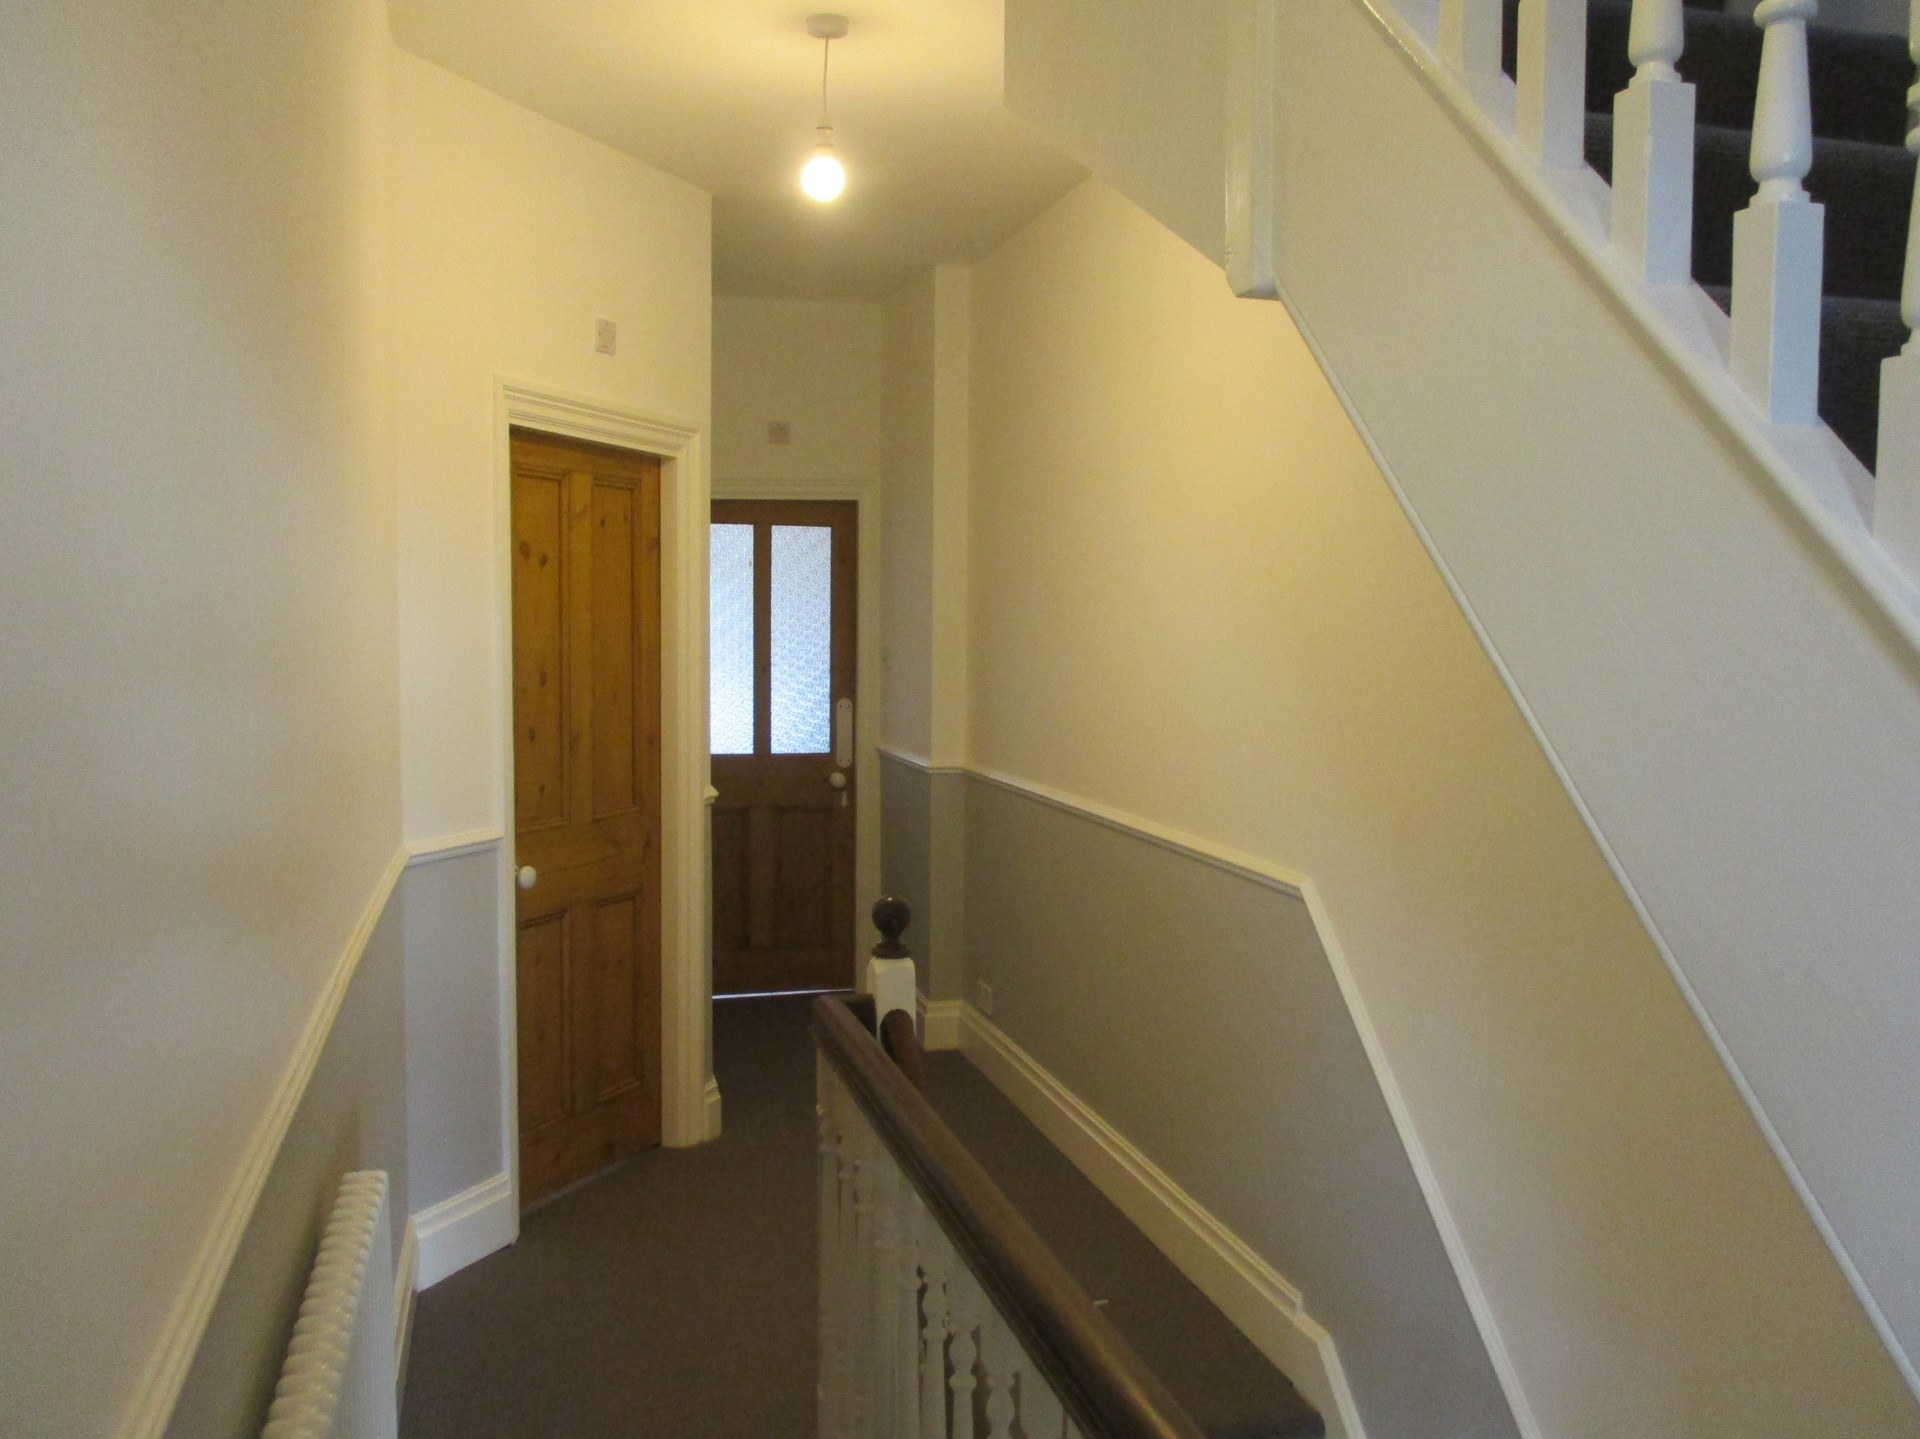 painted finished hallway